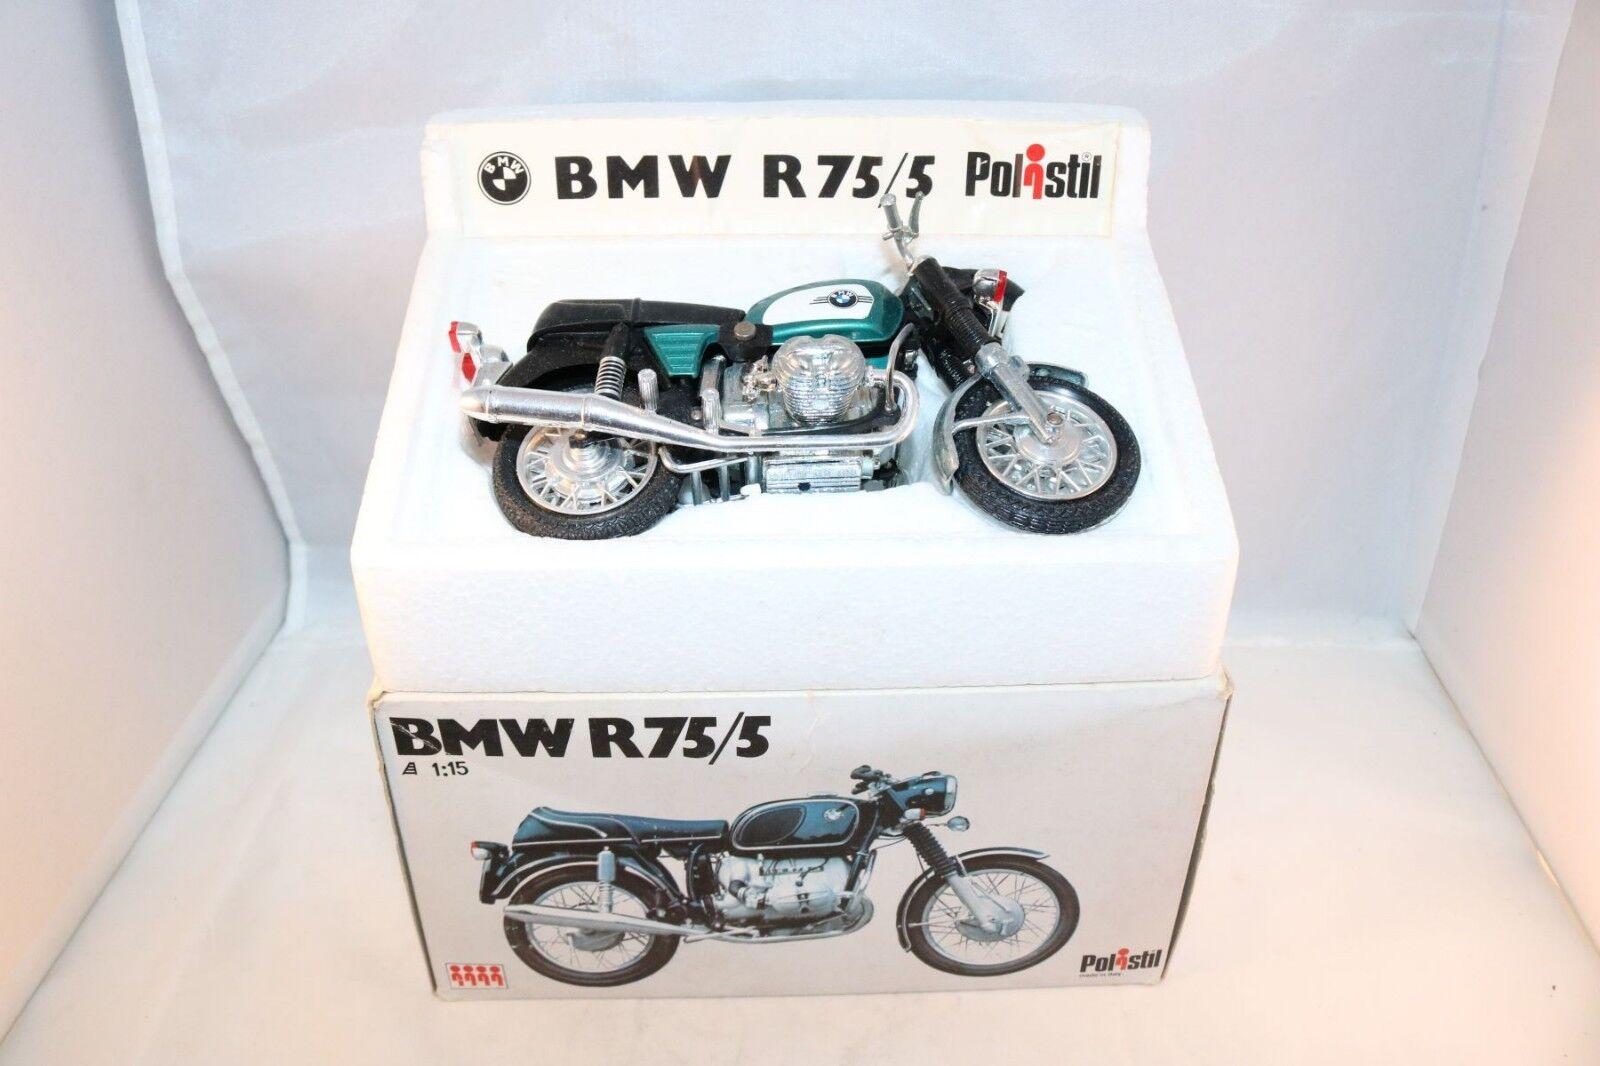 Polistil MS 105 BMW R75 5 motorcycle 99.9% mint in box 1 15 all original